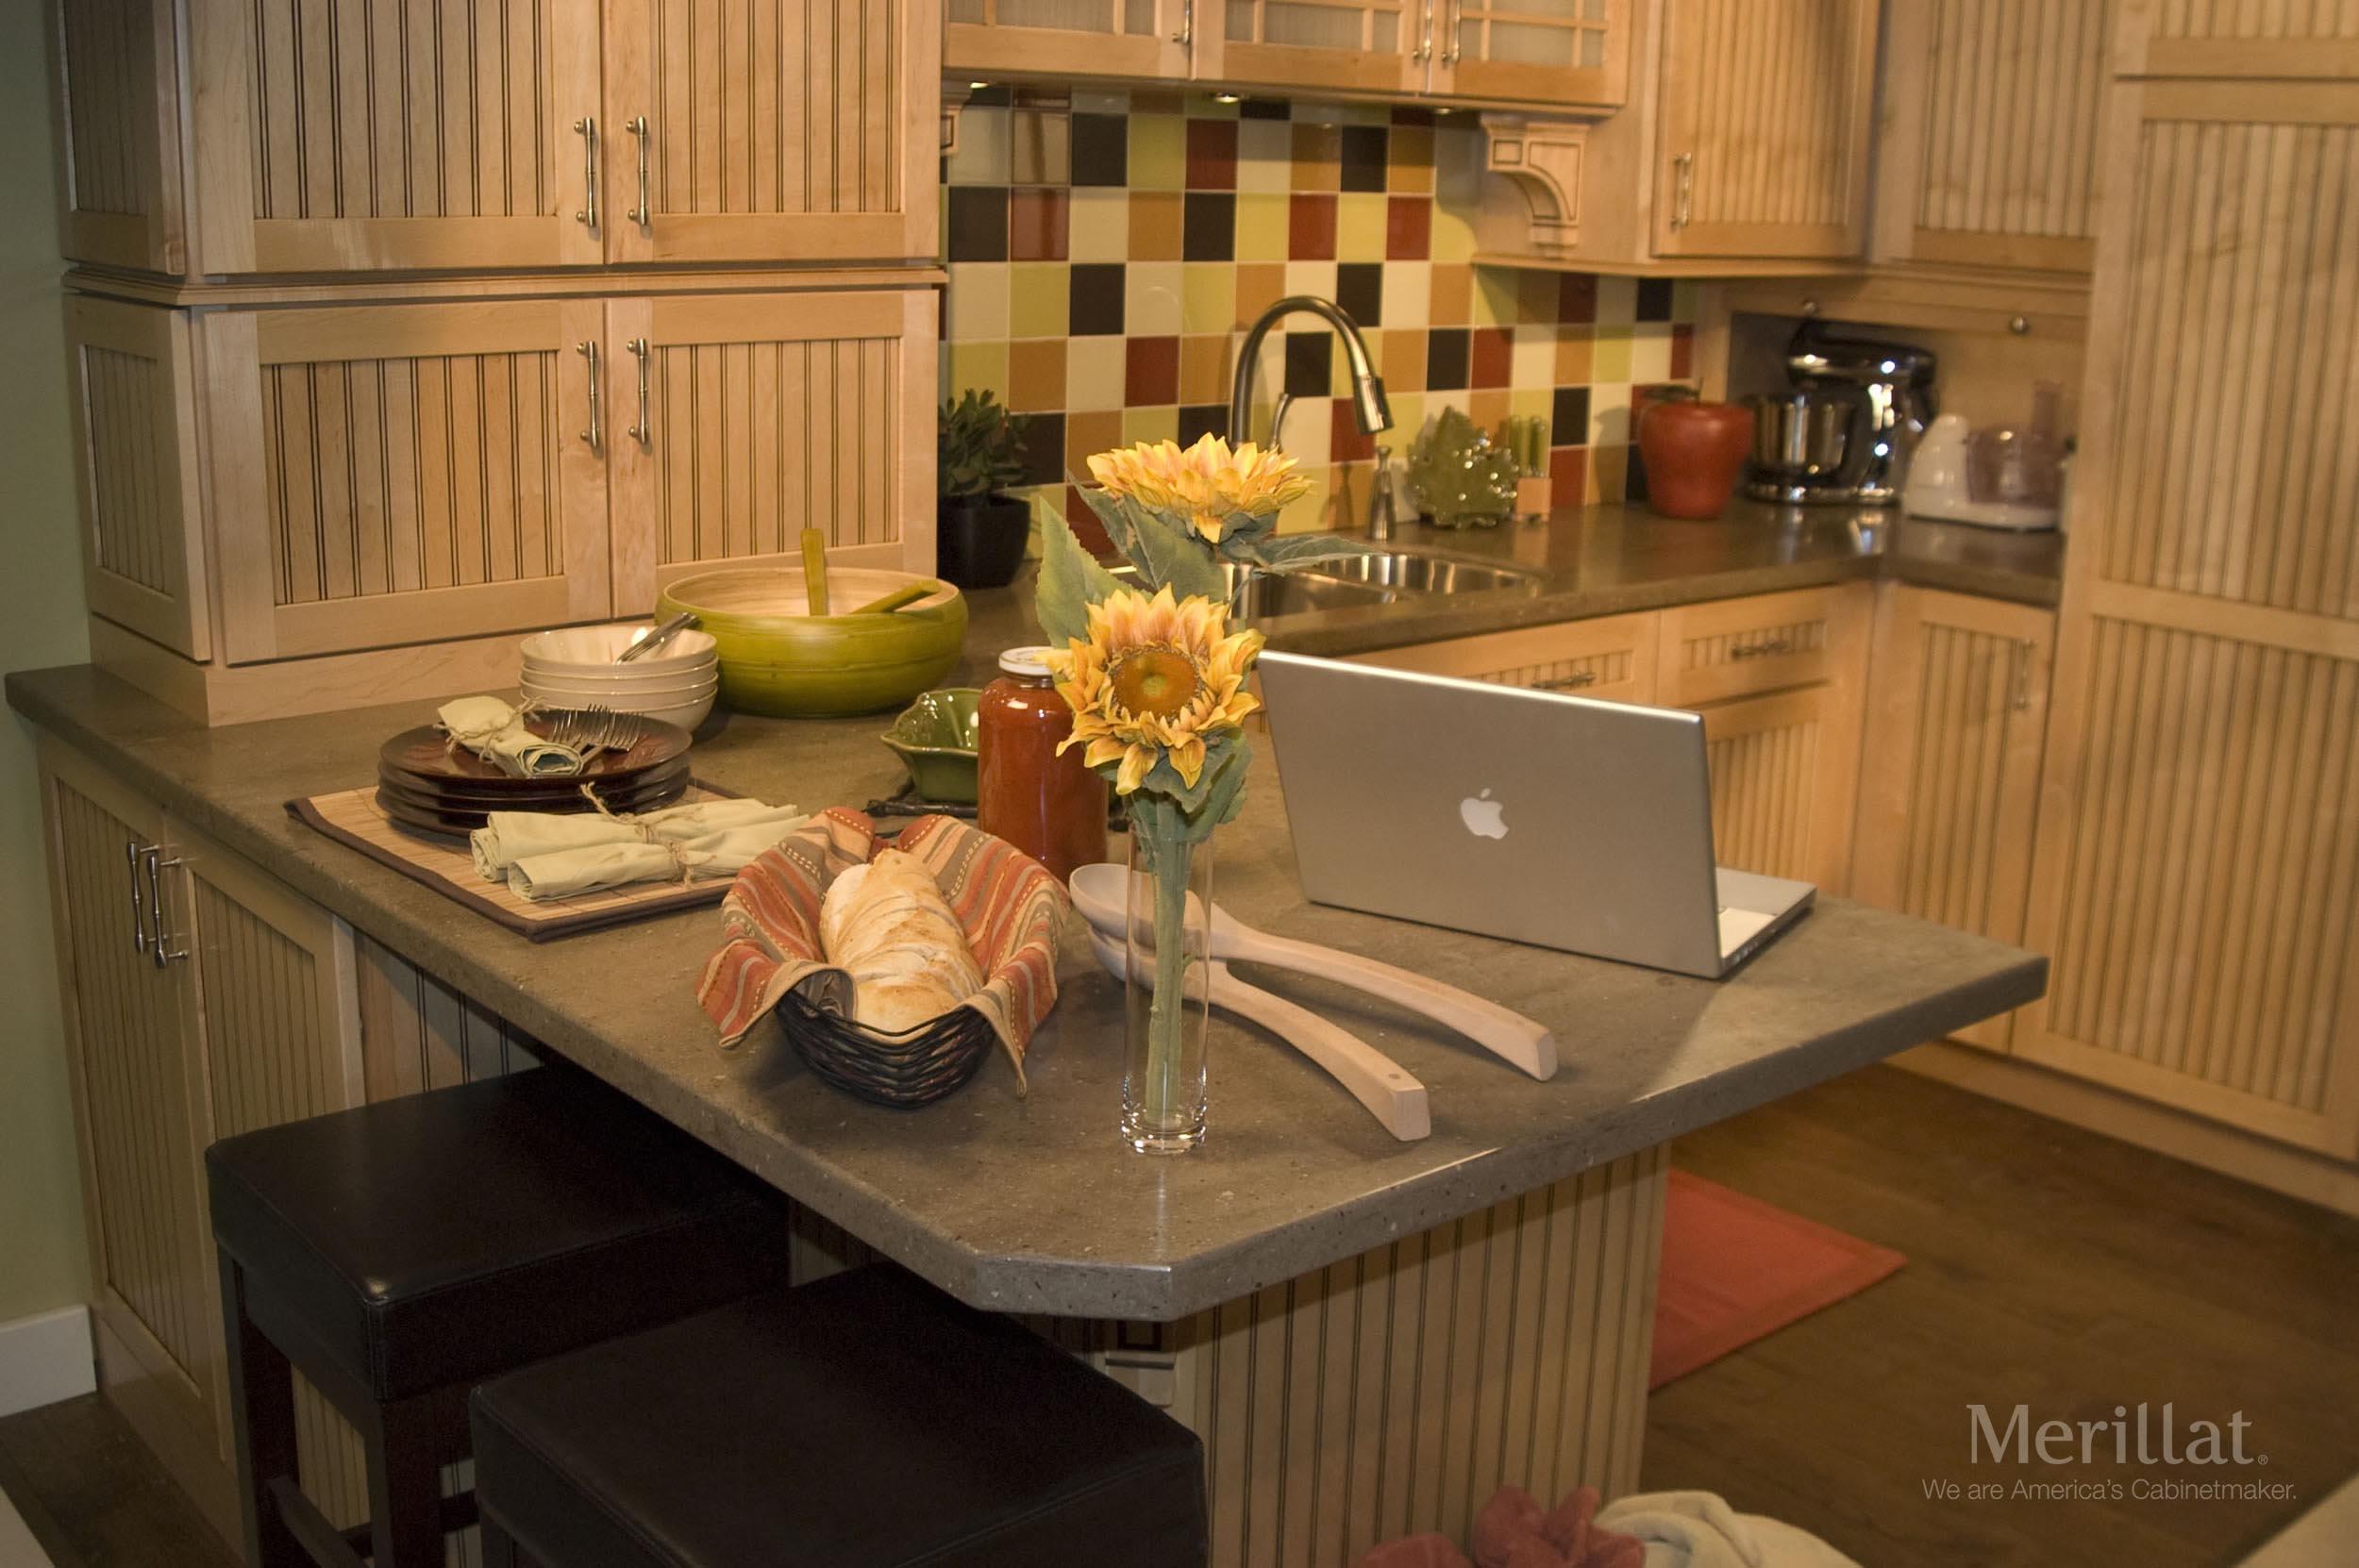 Merillat Kitchen Cabinets Merillat Classicr Avenue W 5 Piece Drawer In Maple Natural With